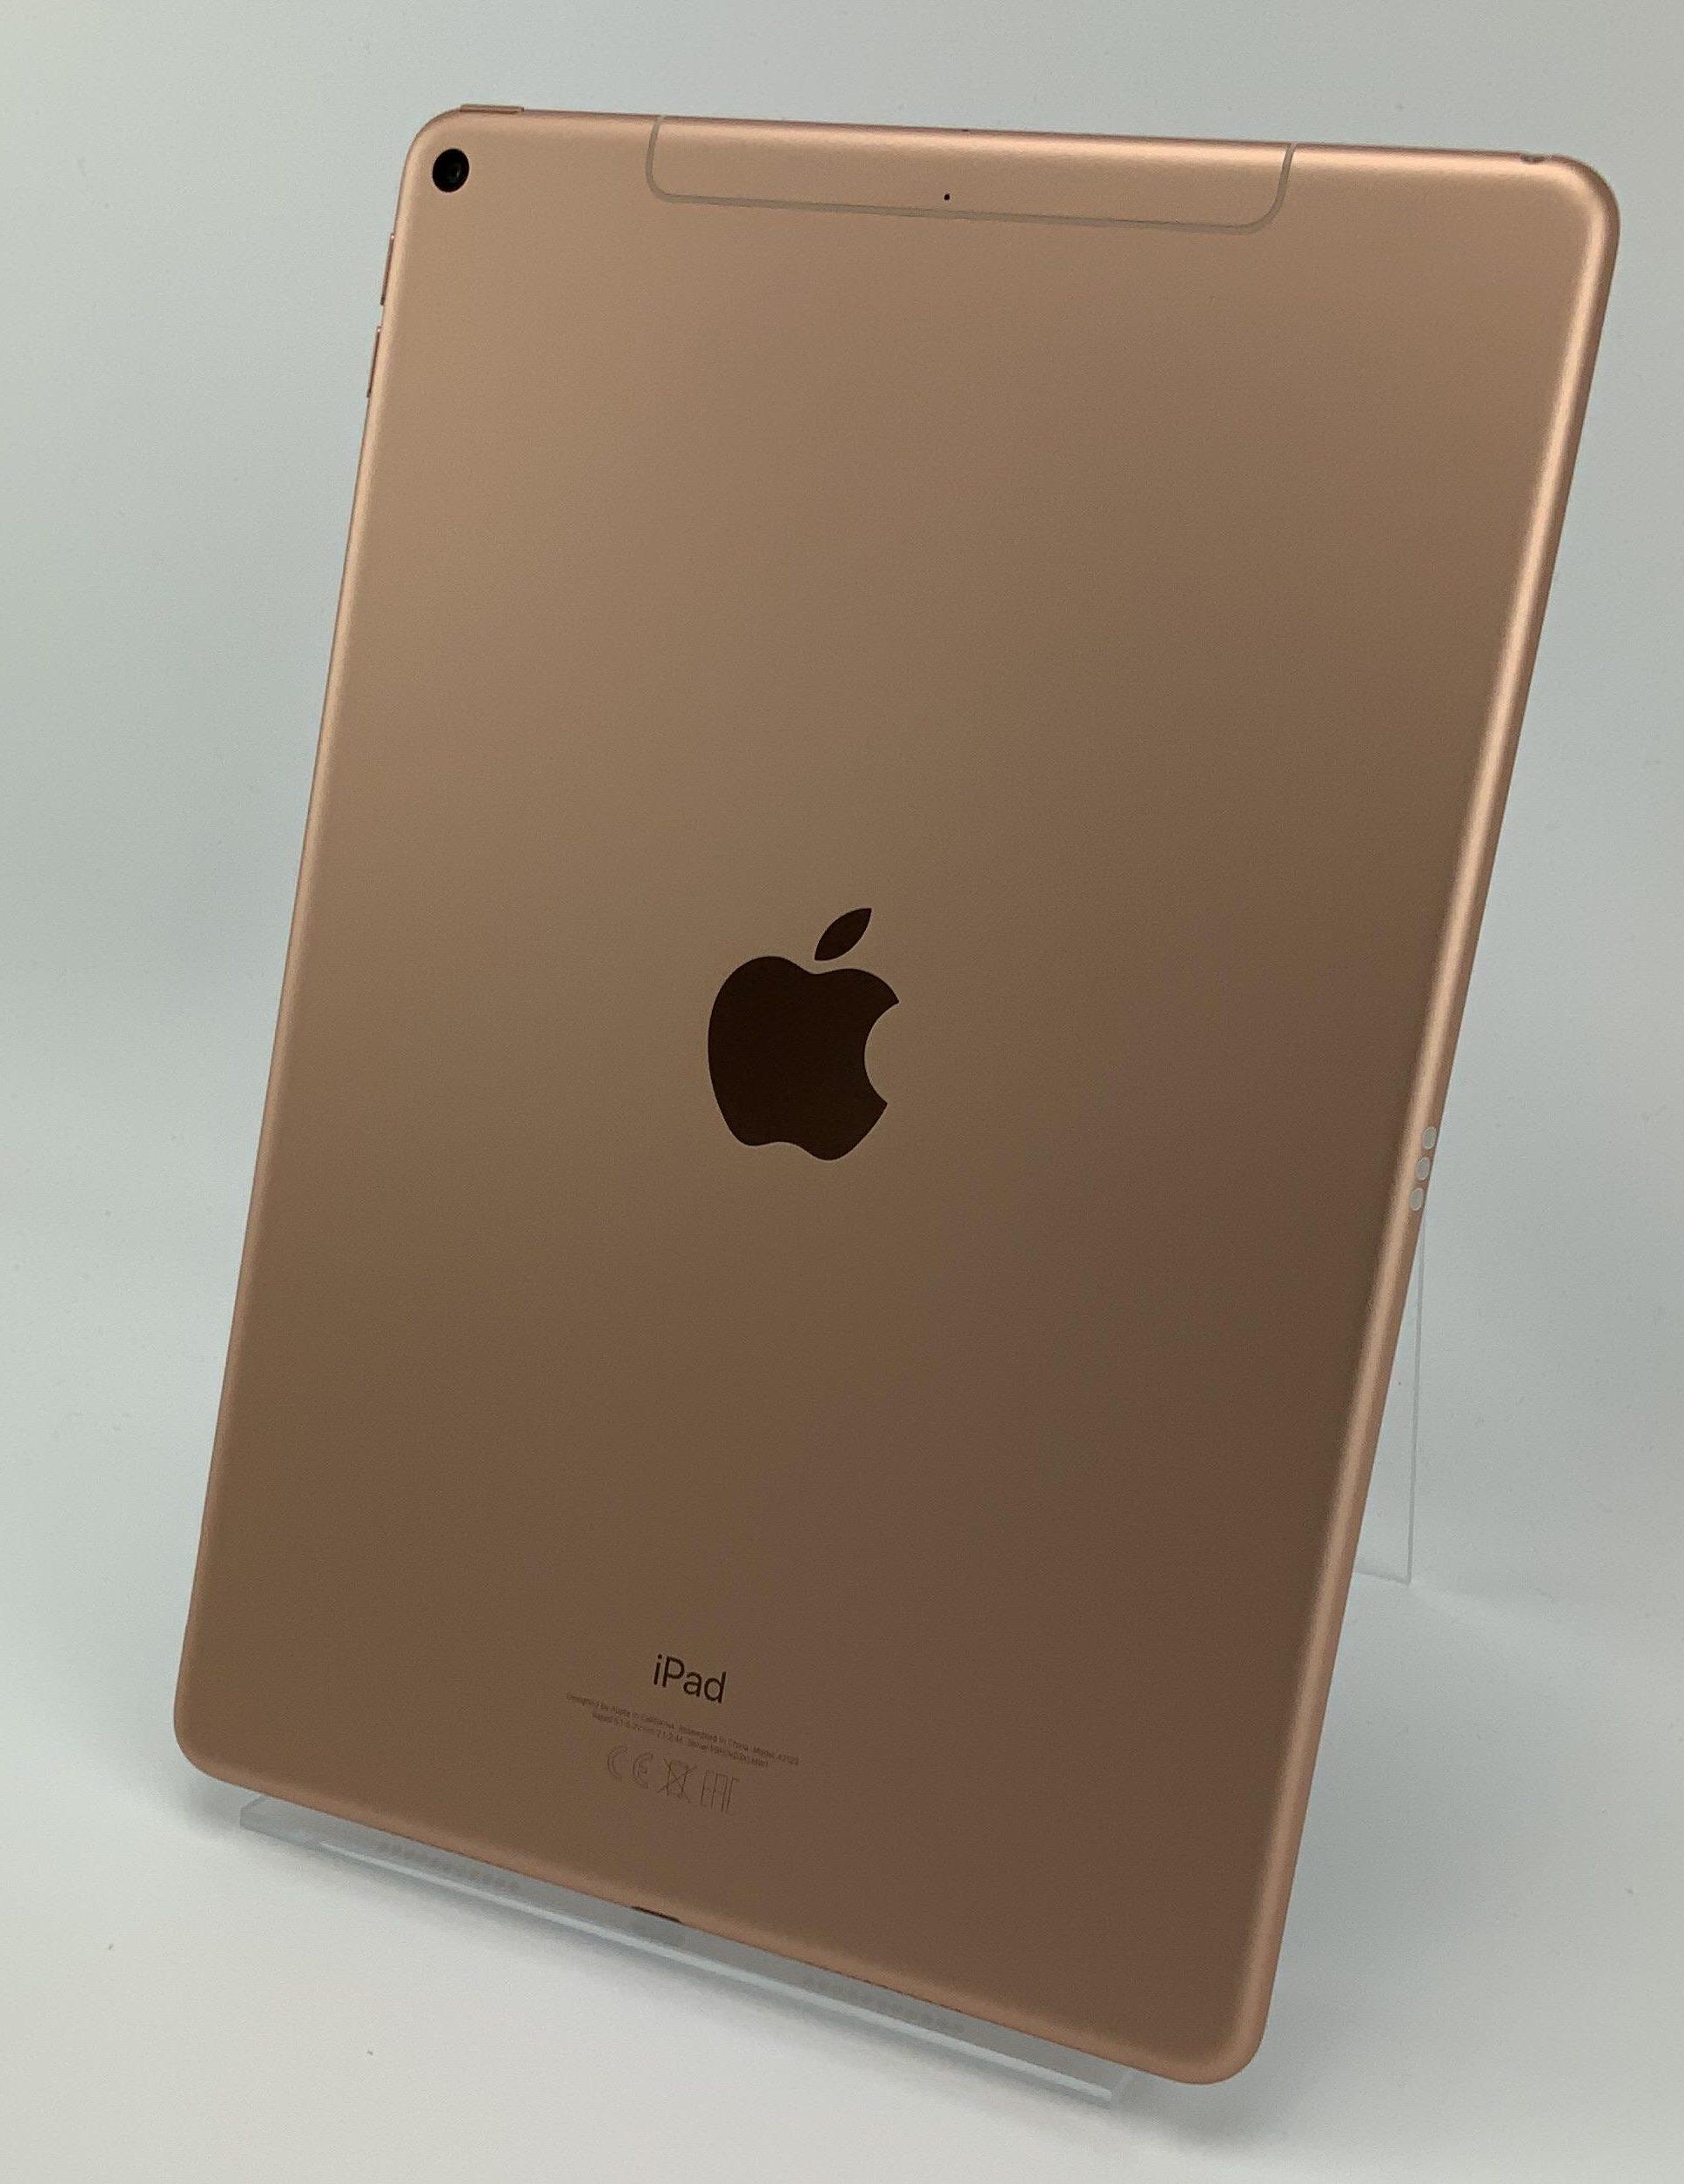 iPad Air 3 Wi-Fi + Cellular 64GB, 64GB, Gold, image 2